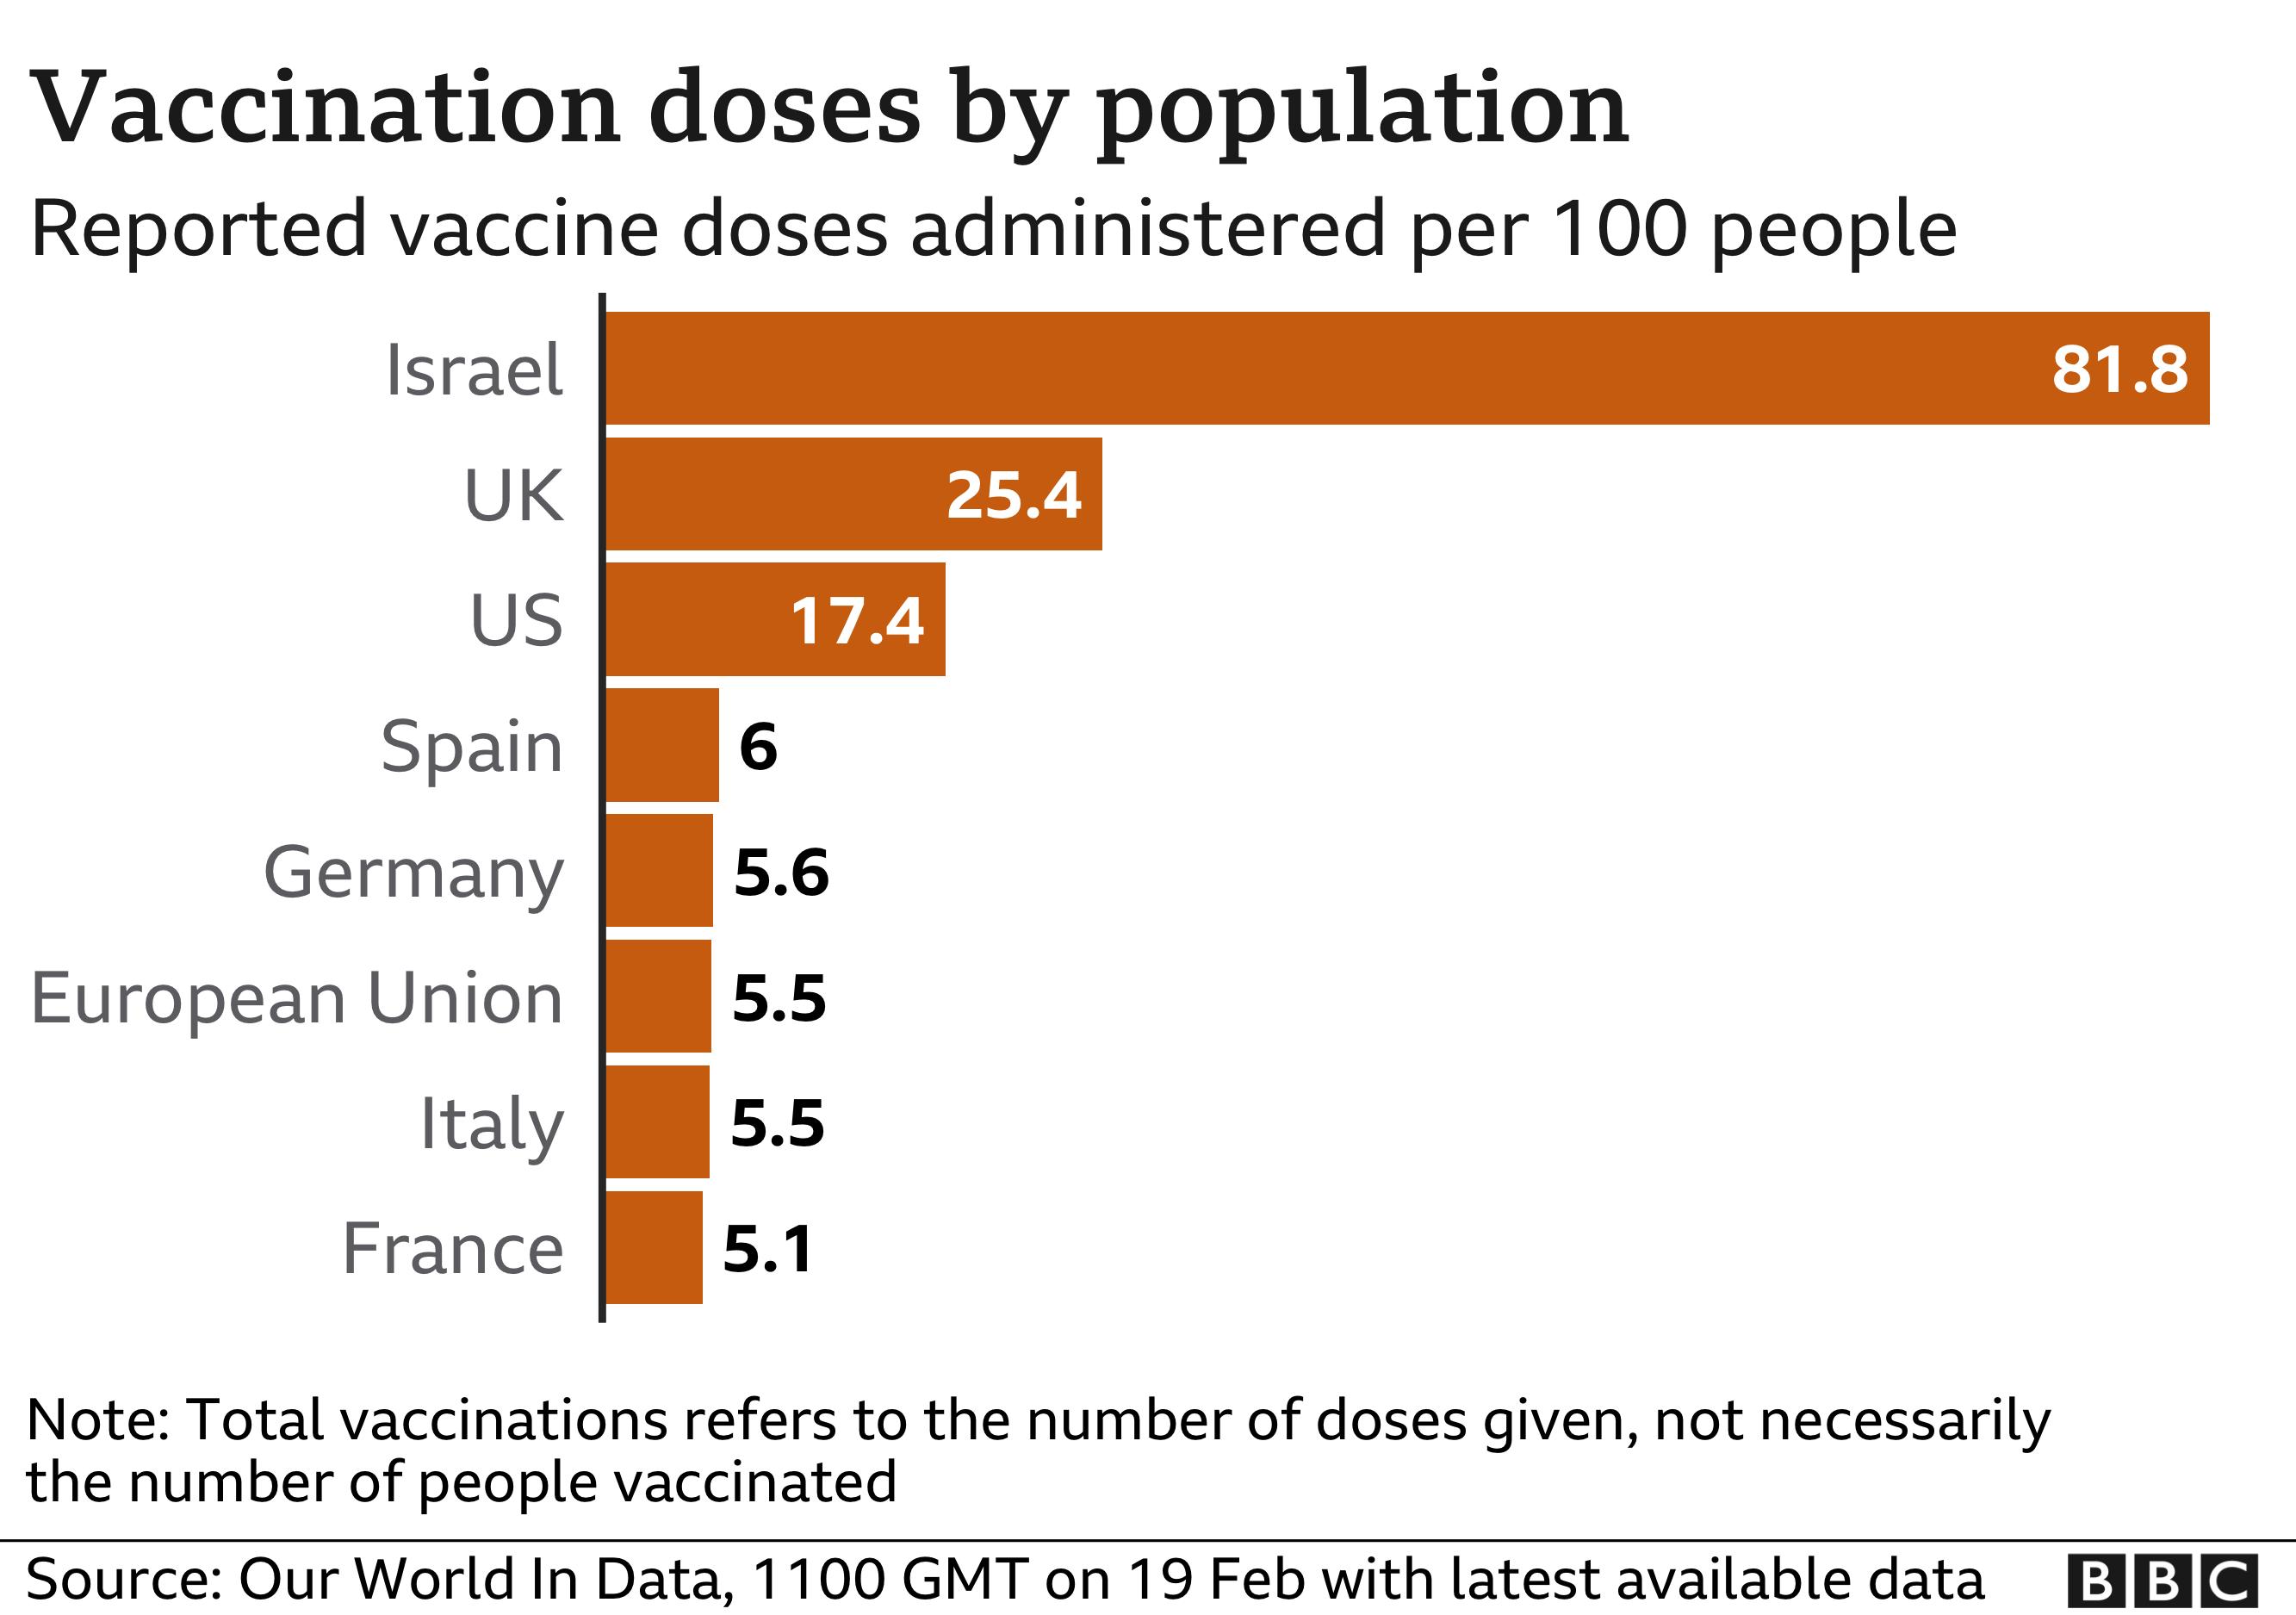 Vaccine doses graphic per population